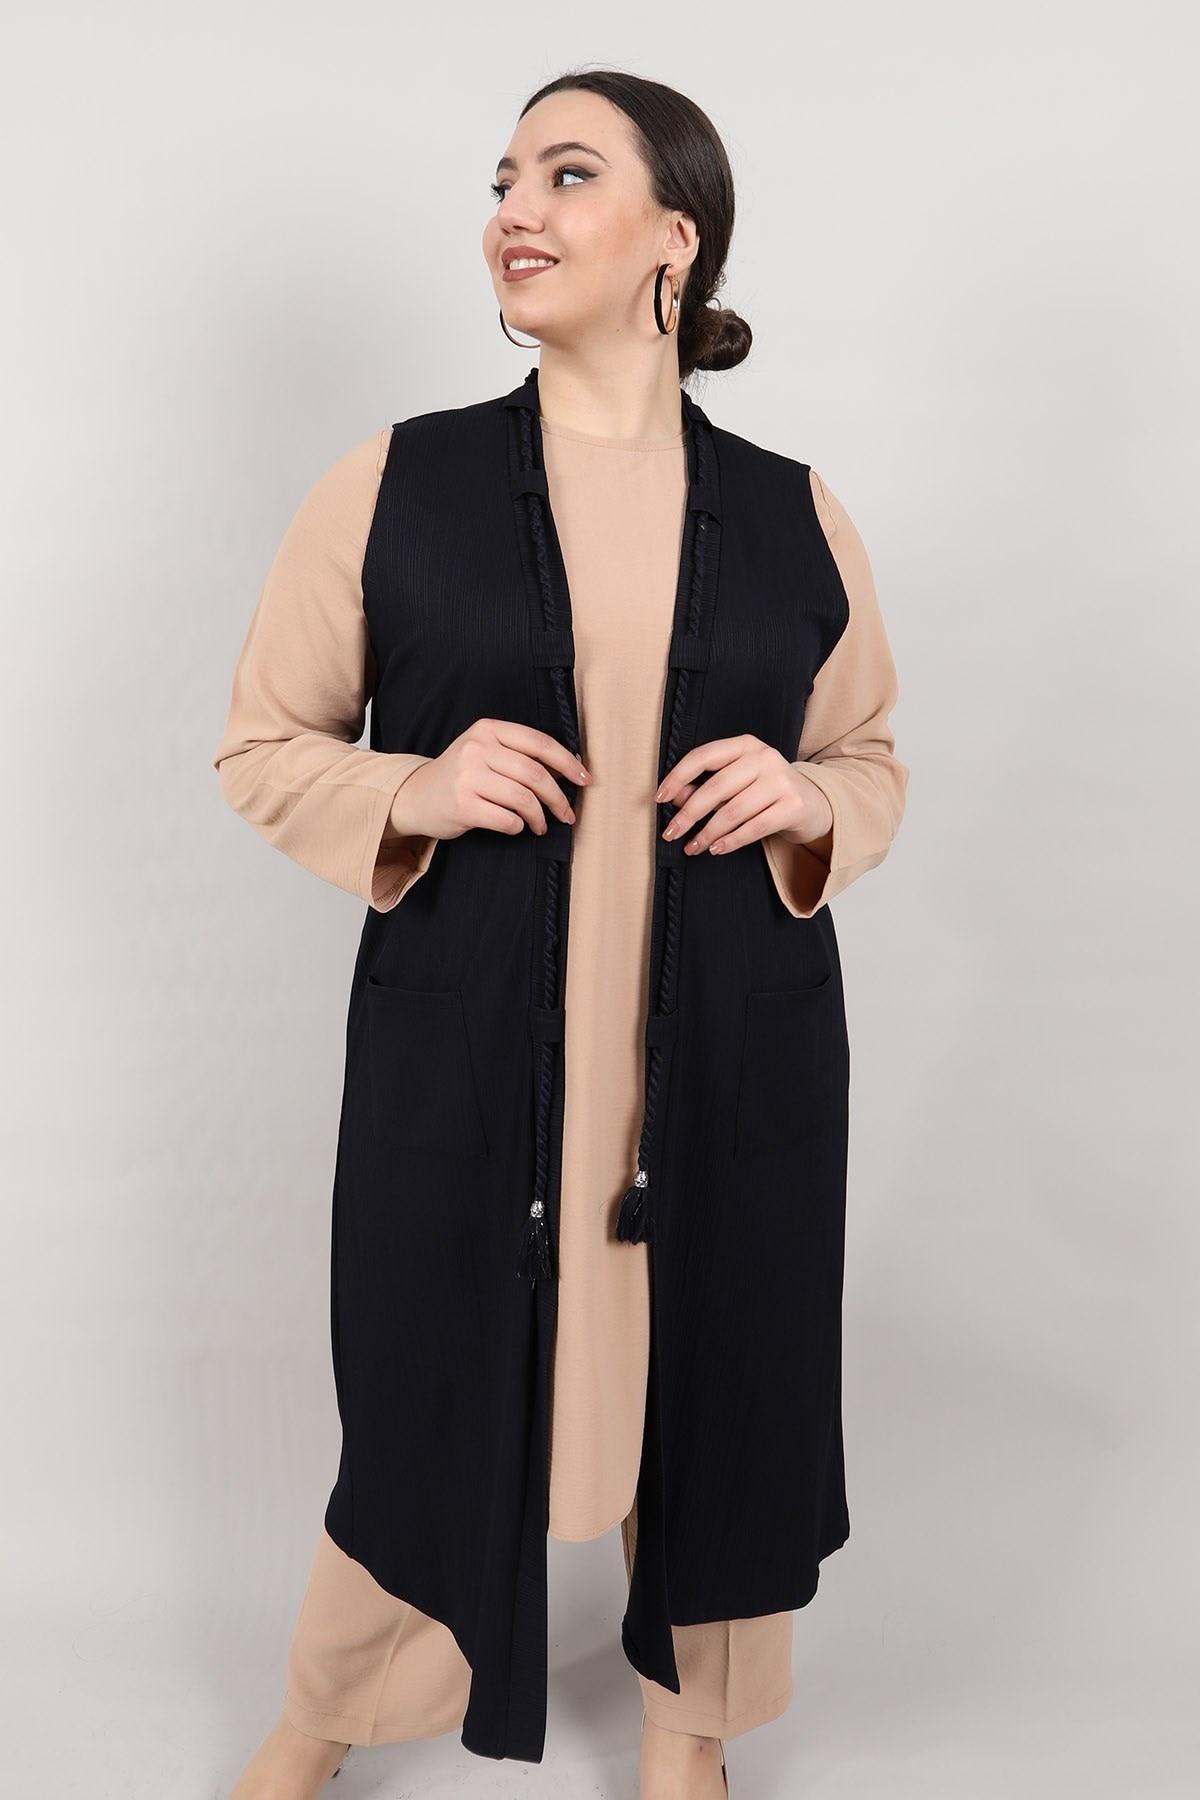 Plus Size Vest KadoModa Navy Blue